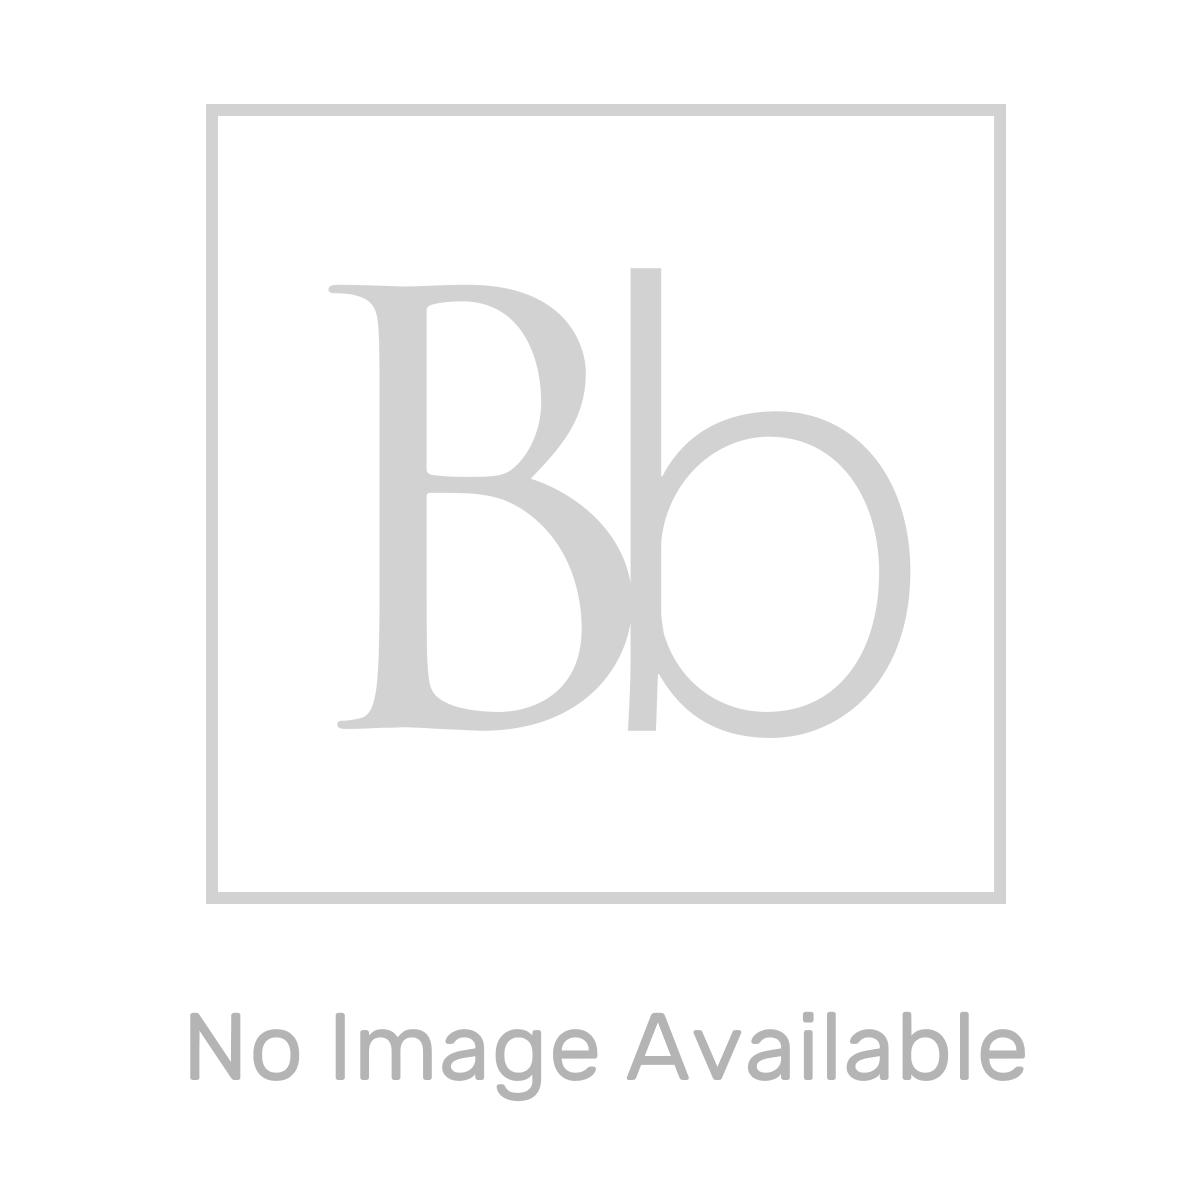 Elation Eko Graphite Gloss Vanity Unit with Slab Door 550mm